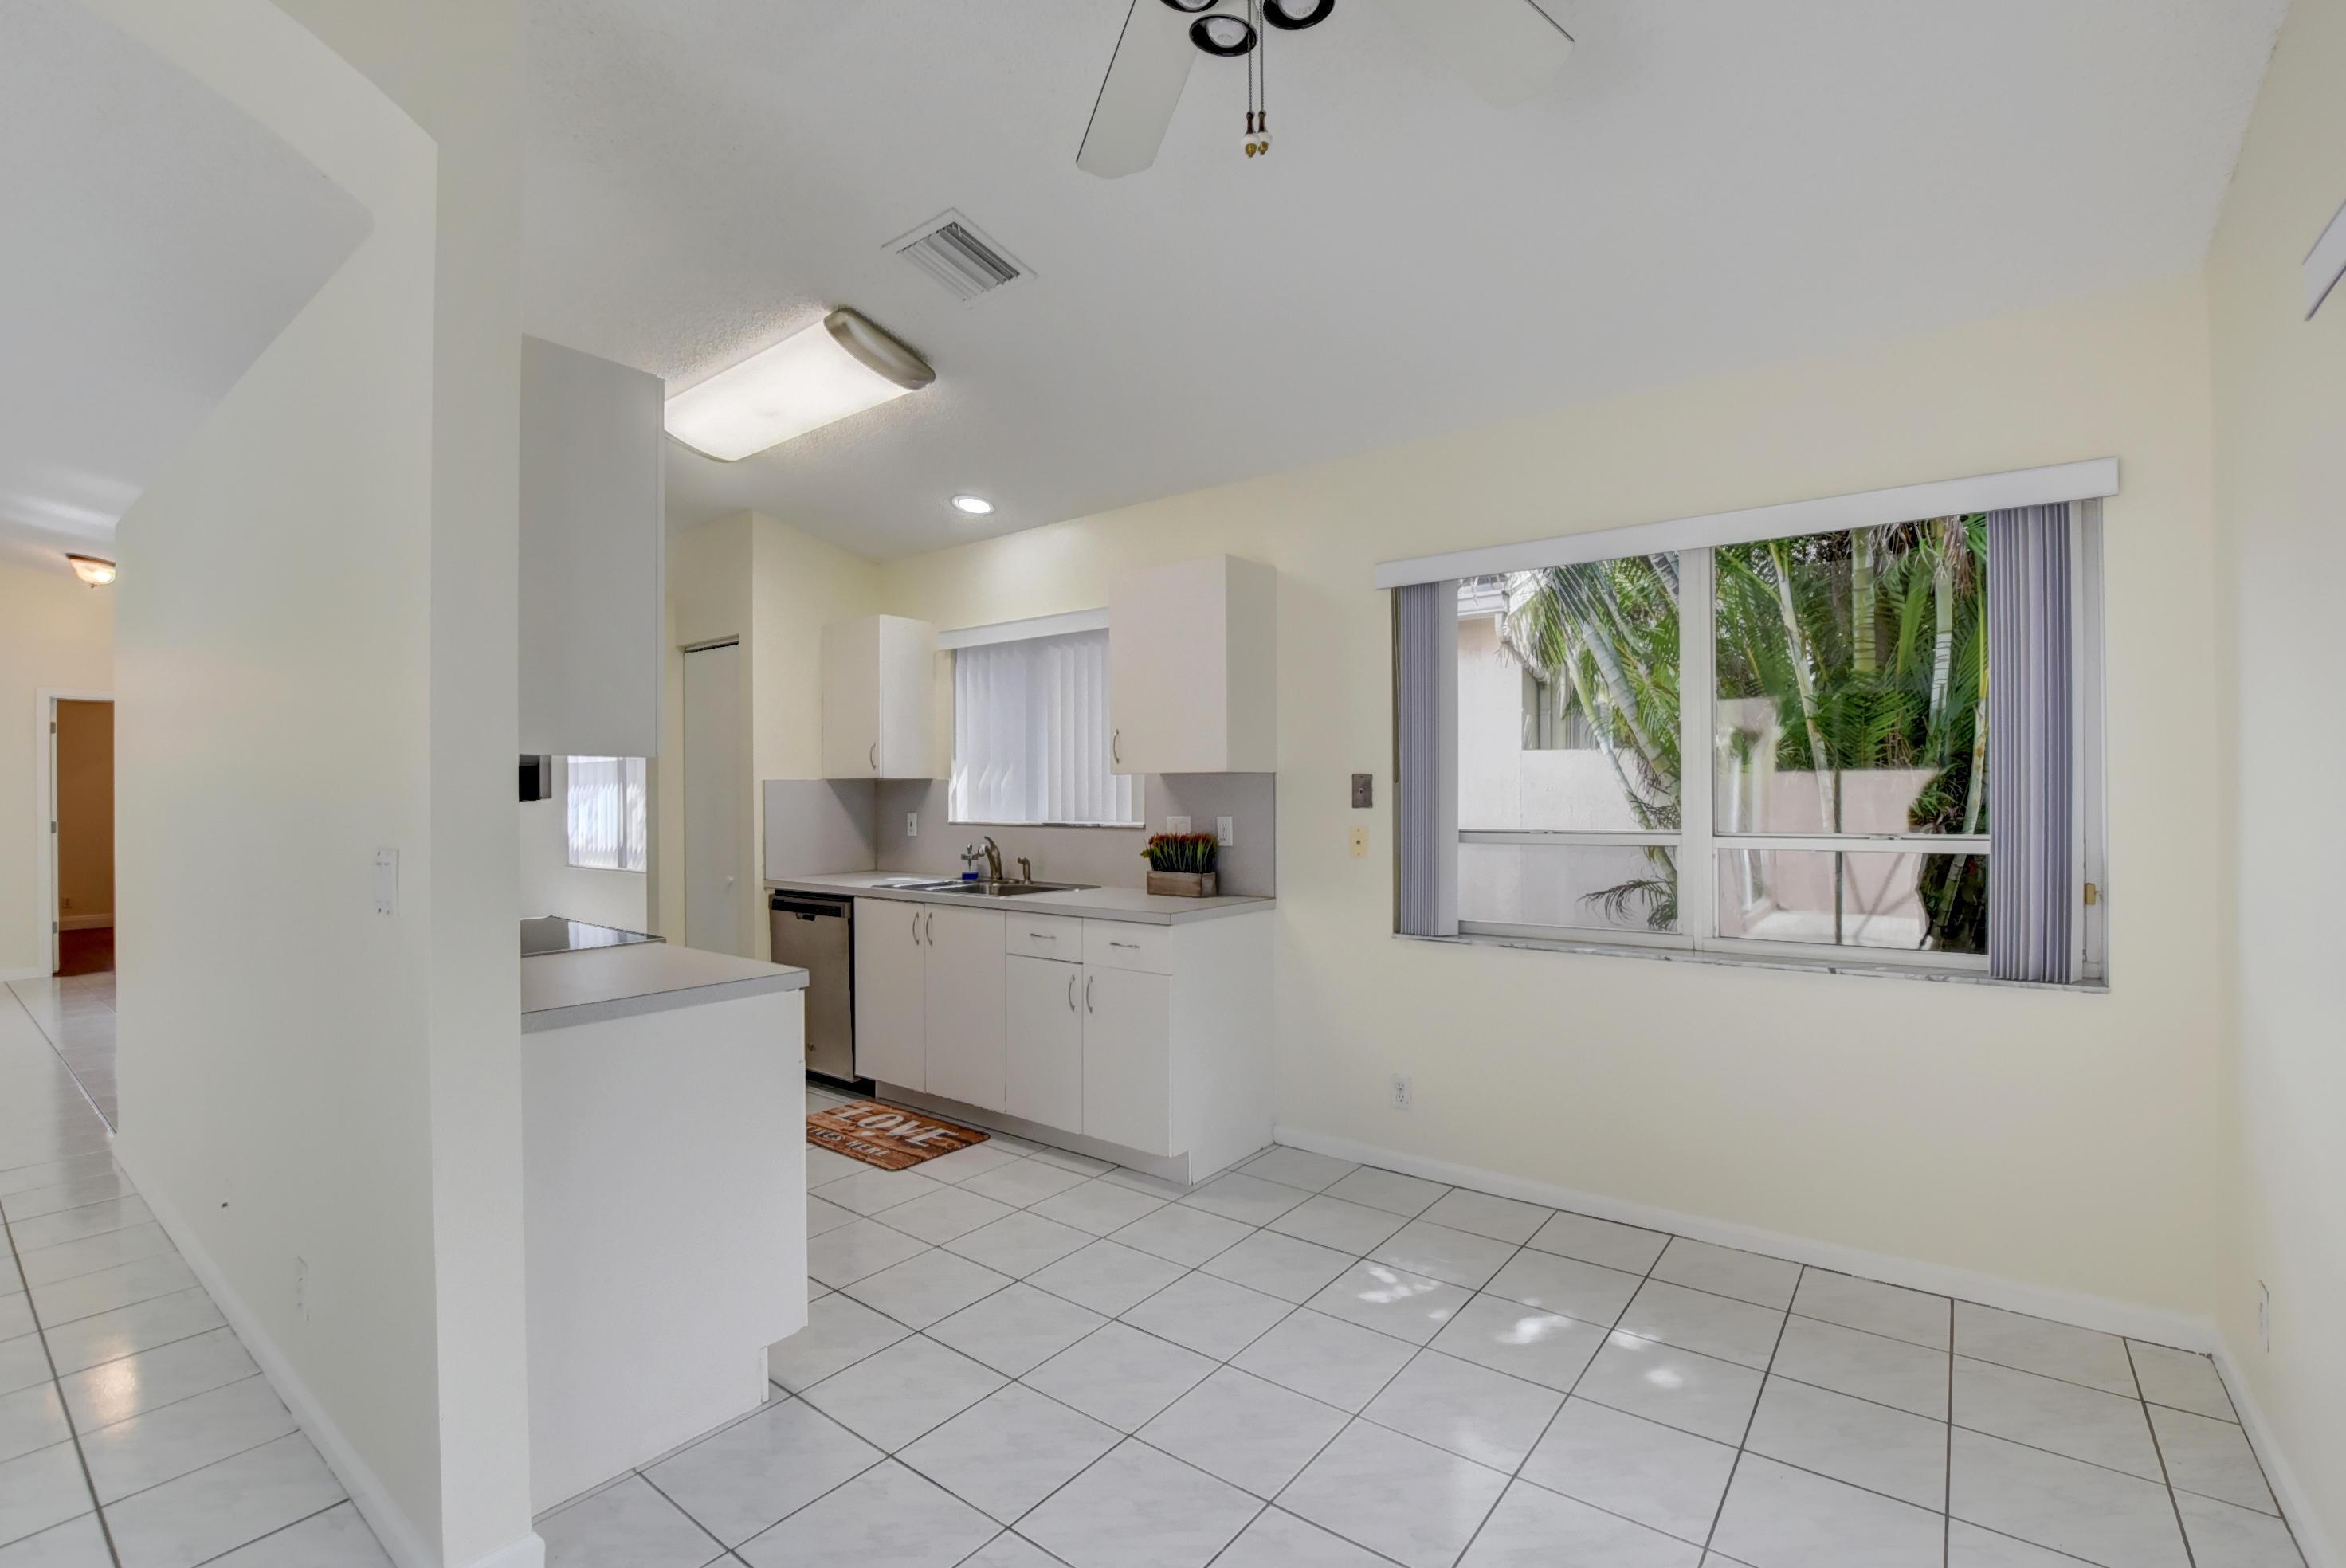 7884 Travelers Tree Drive, Boca Raton, FL 33433